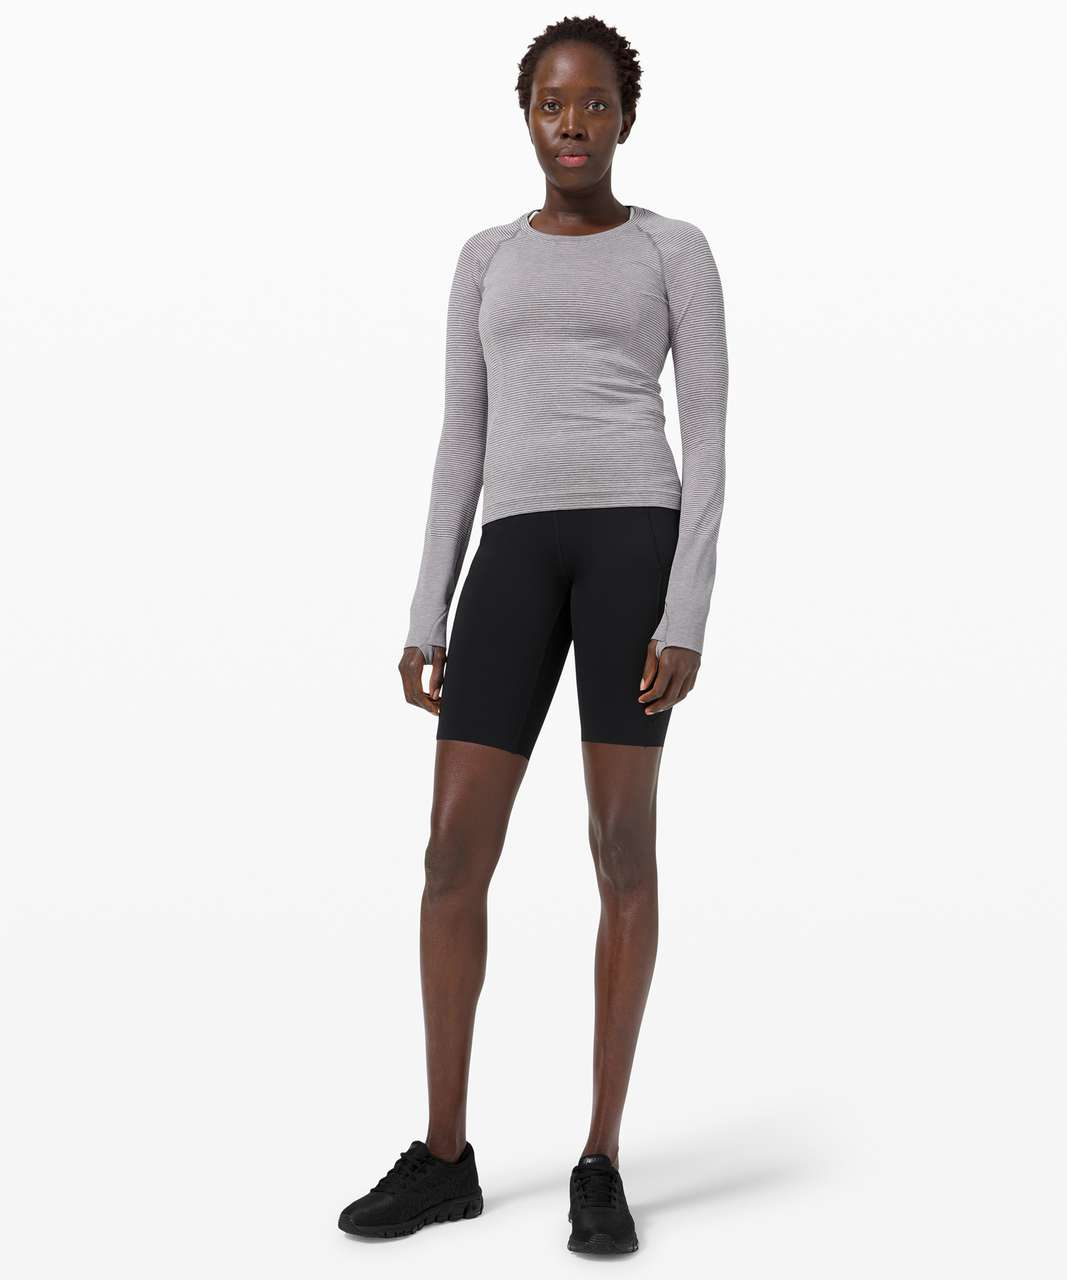 Lululemon Swiftly Tech Long Sleeve 2.0 *Race Length - Tetra Stripe Asphalt Grey / Violet Verbena